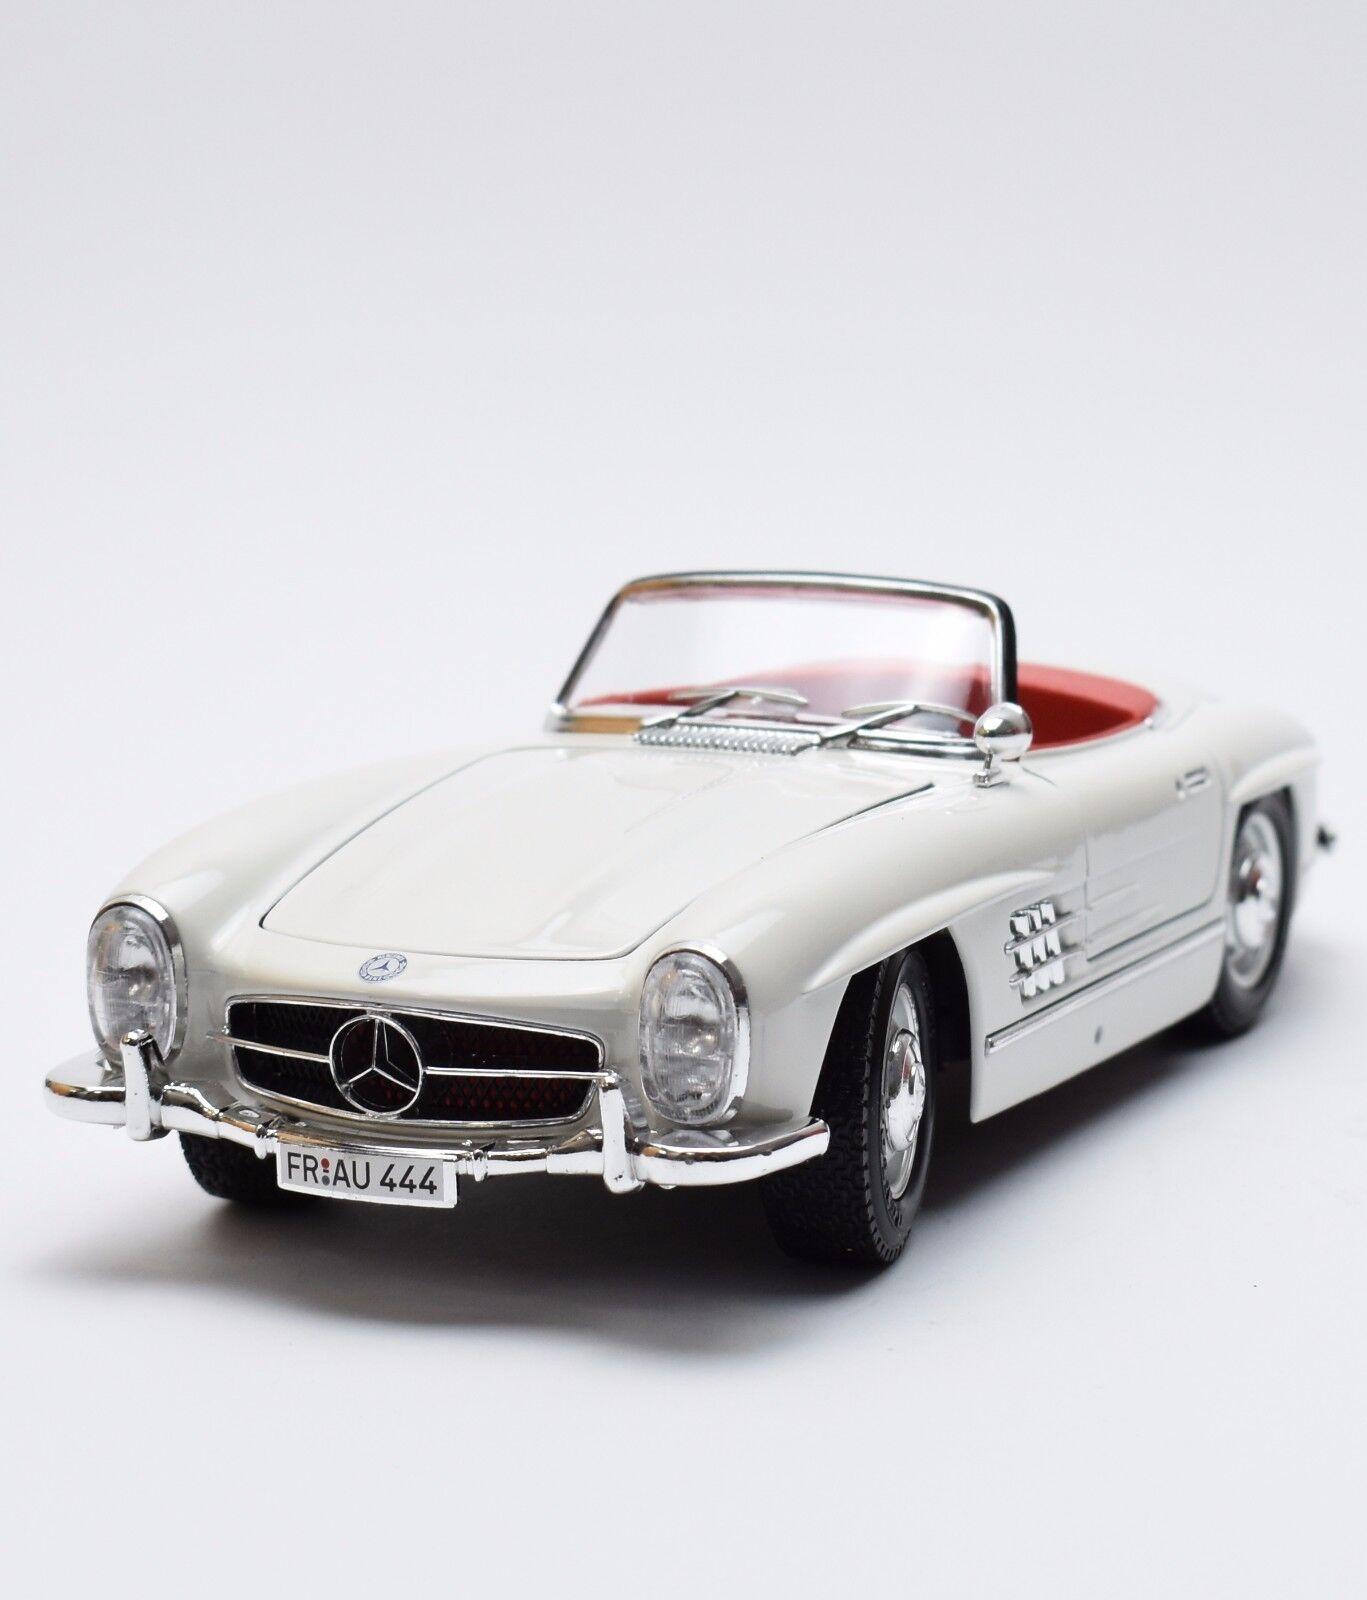 Mercedes Benz 300 SL Voiture De Sport En Blanc laqué, Bburago 3023, neuf dans sa boîte, 1 18, k011